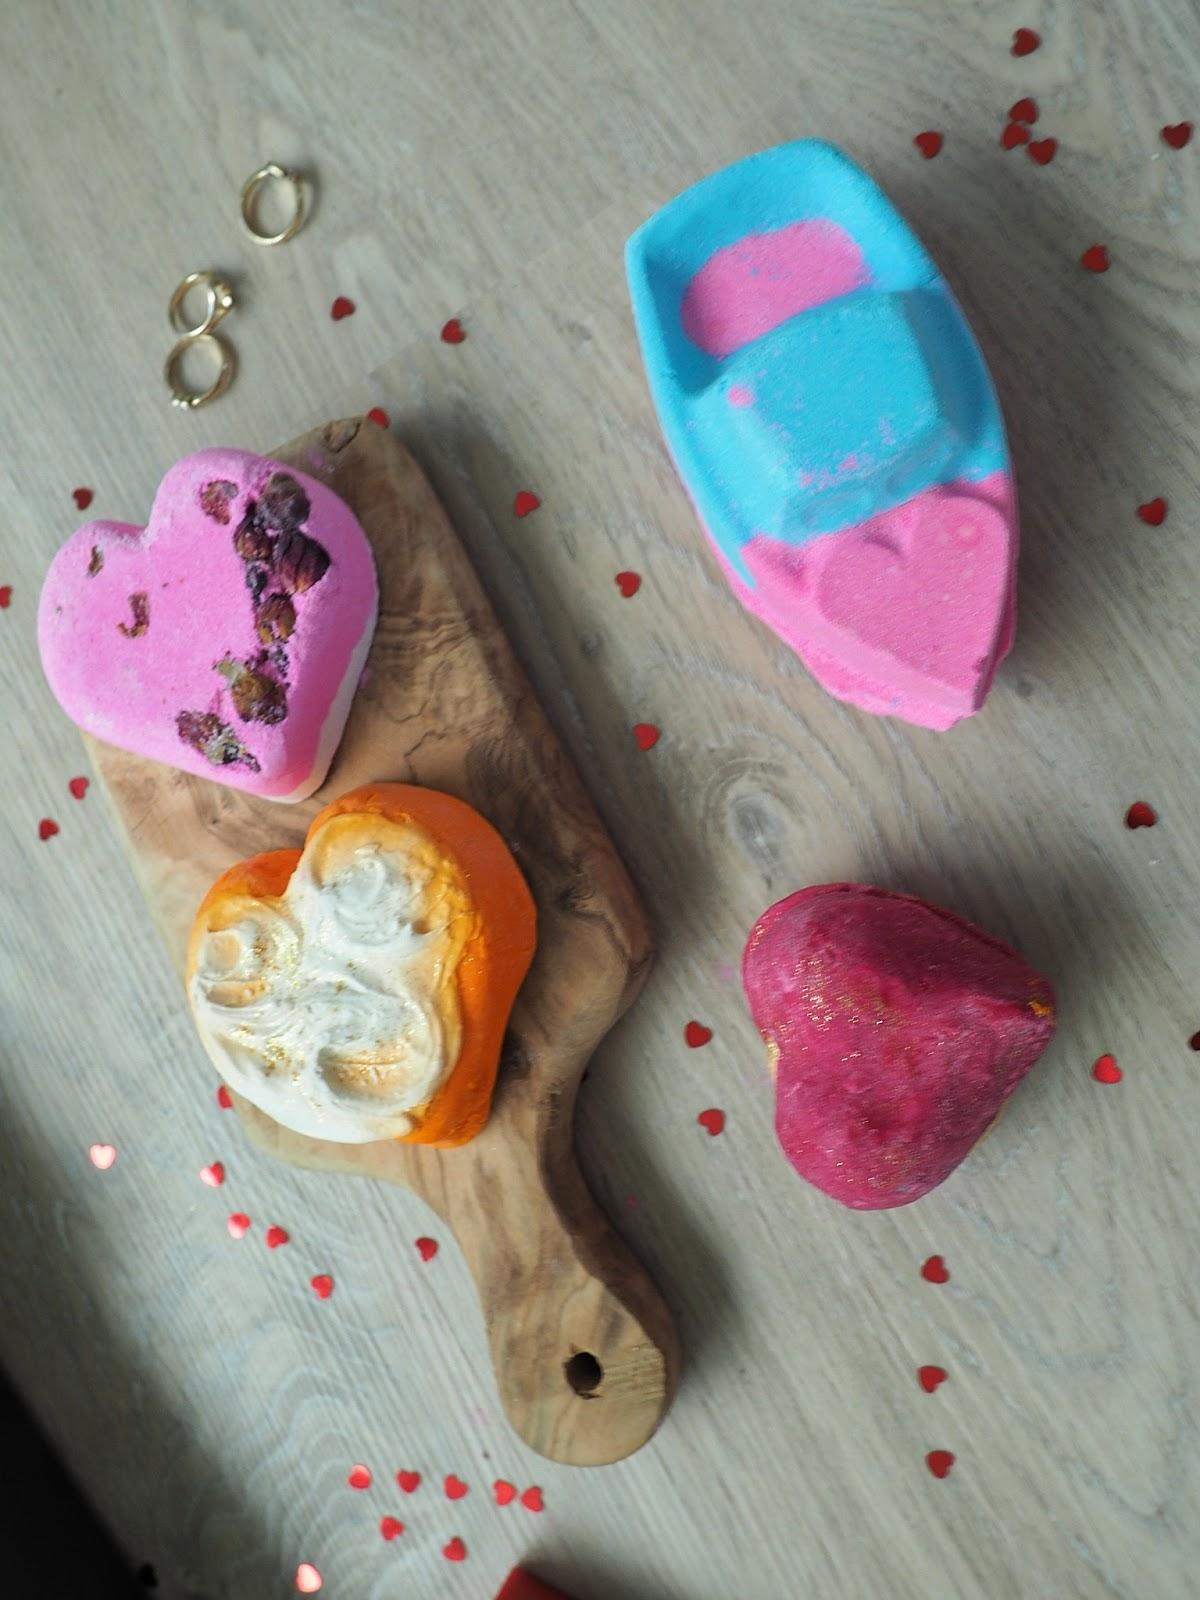 seattle blogger lifestyle beauty gift guide tisty toasty bath melt bath bomb